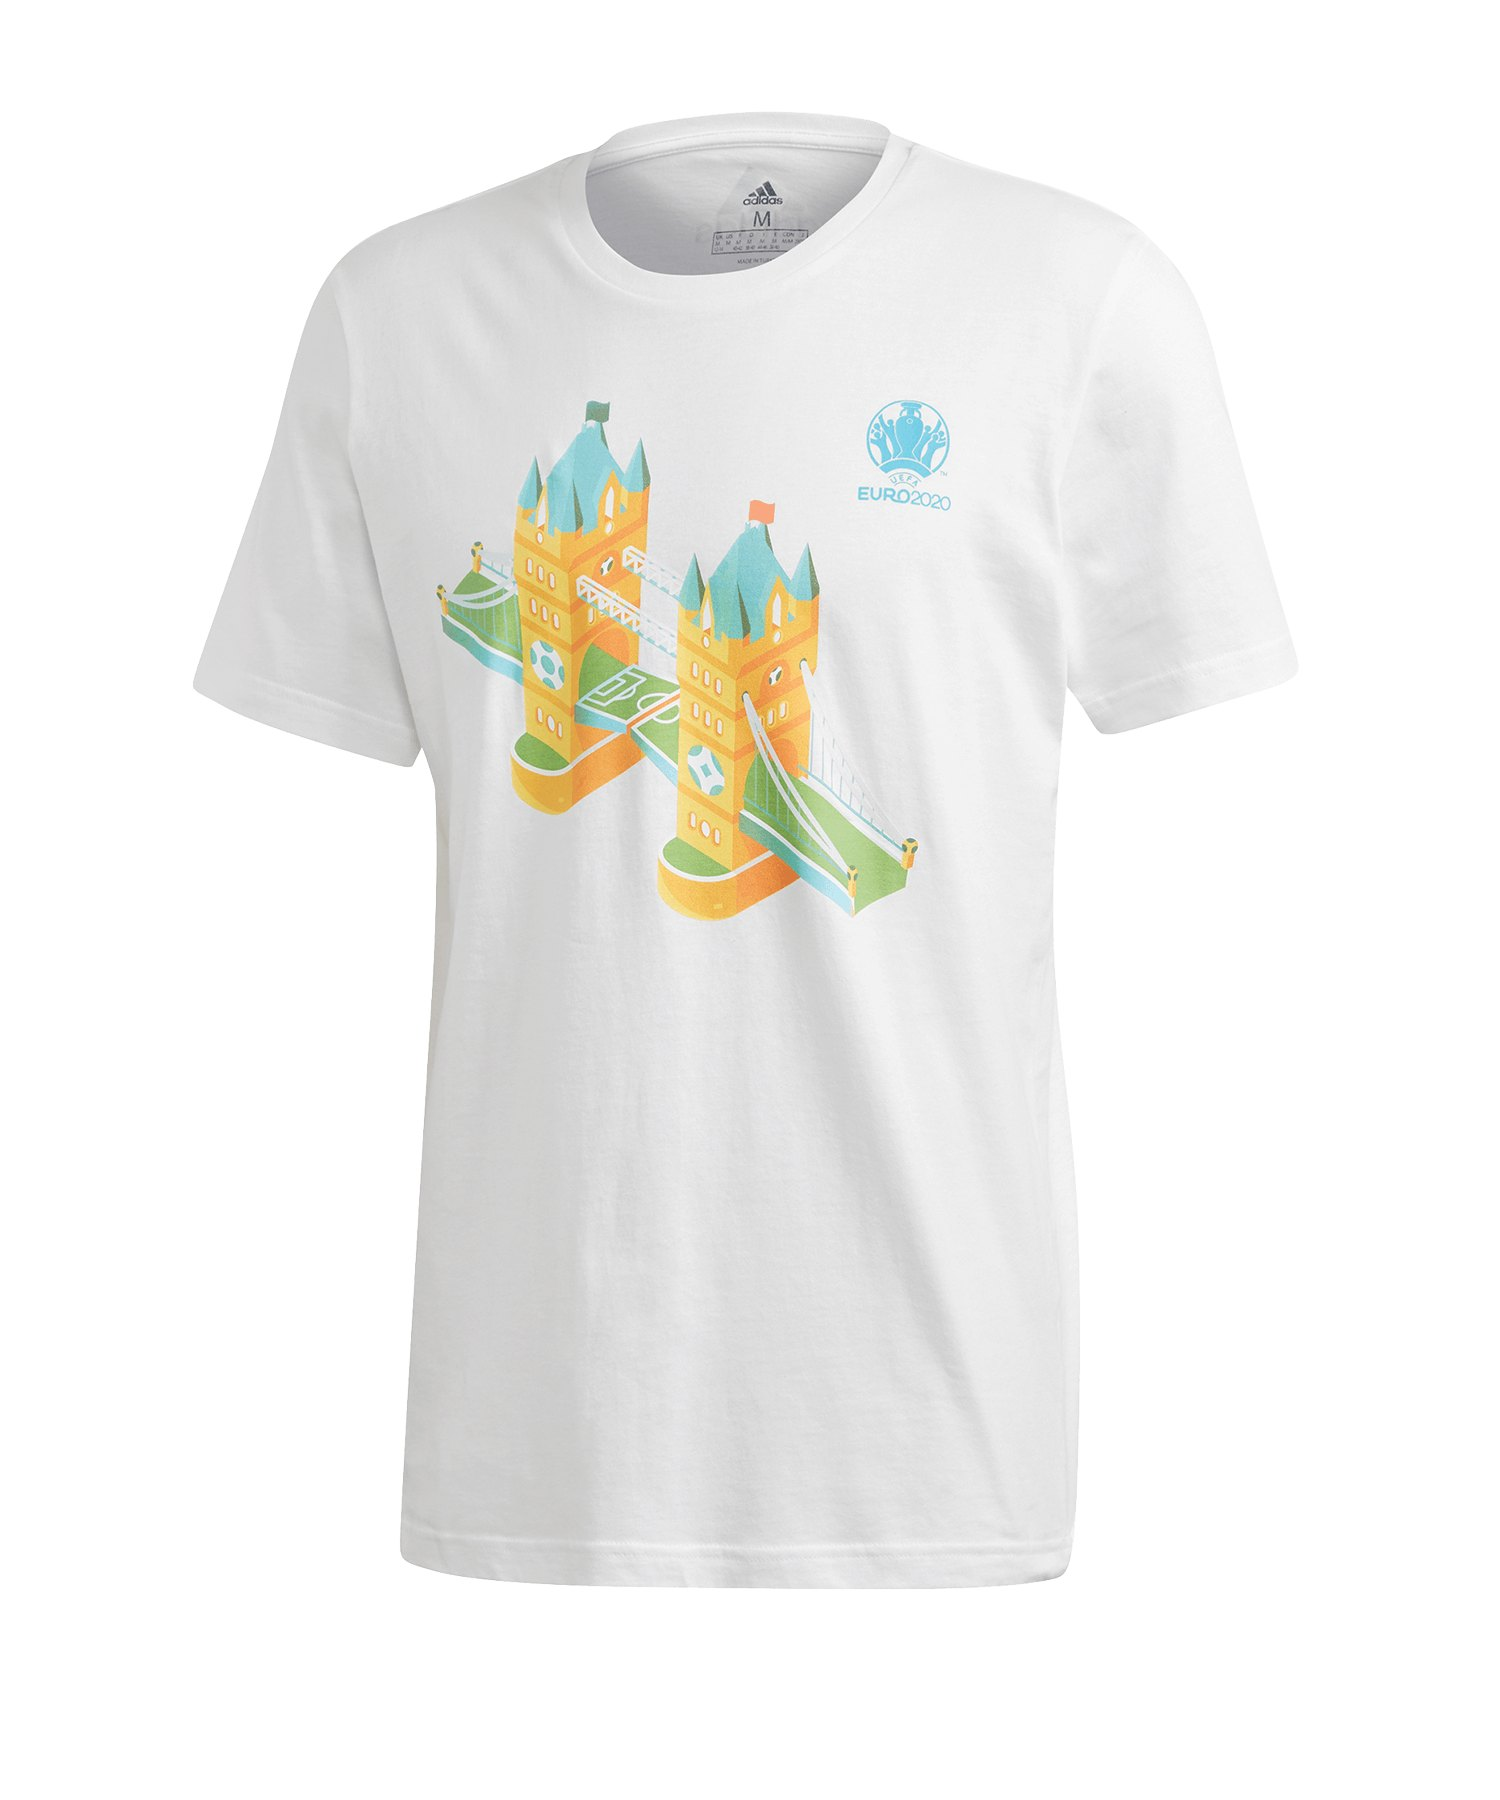 adidas EM 2020 Road to Wembley T-Shirt Weiss - weiss